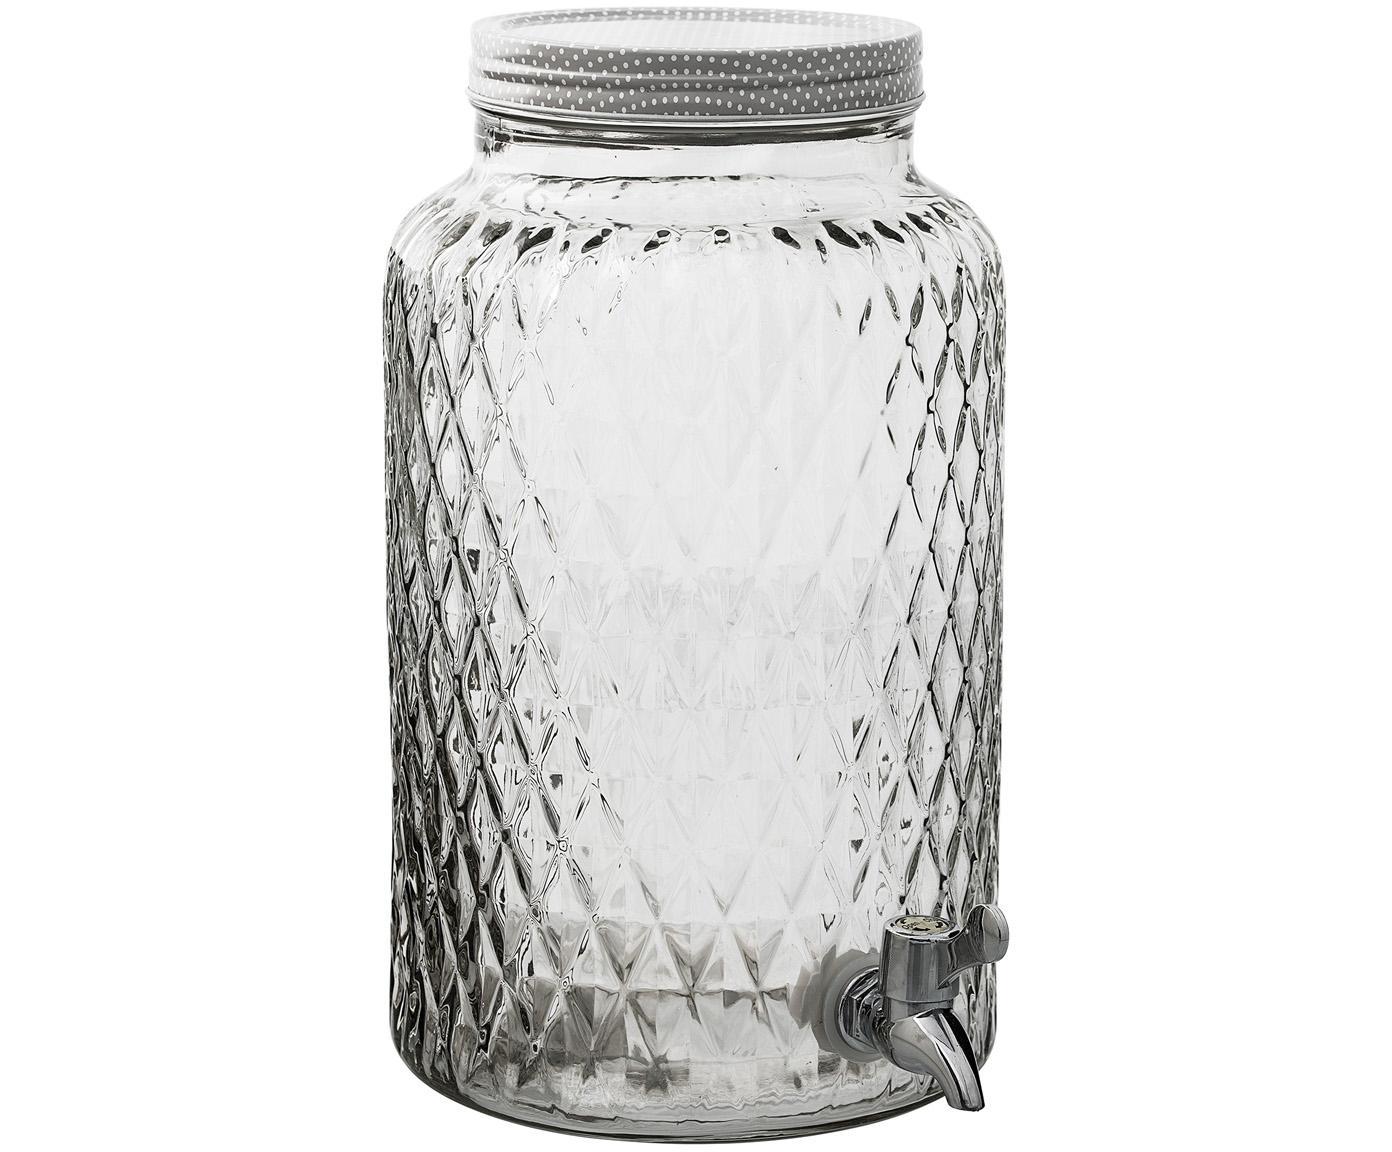 Getränkespender Selma, Behälter: Glas, Transparent, Ø 18 x H 30 cm